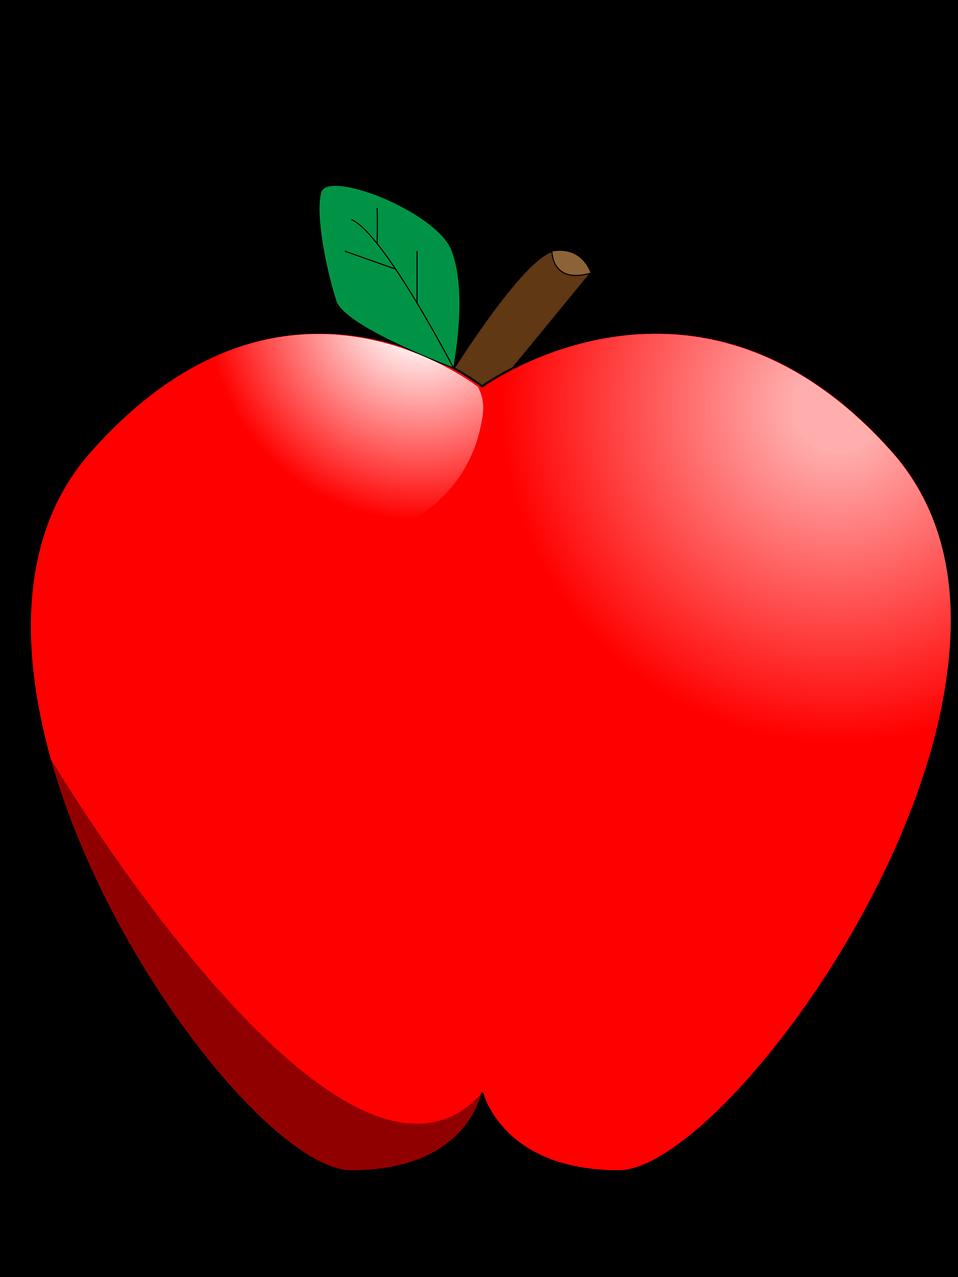 Free stock photo of. Apple clipart illustration